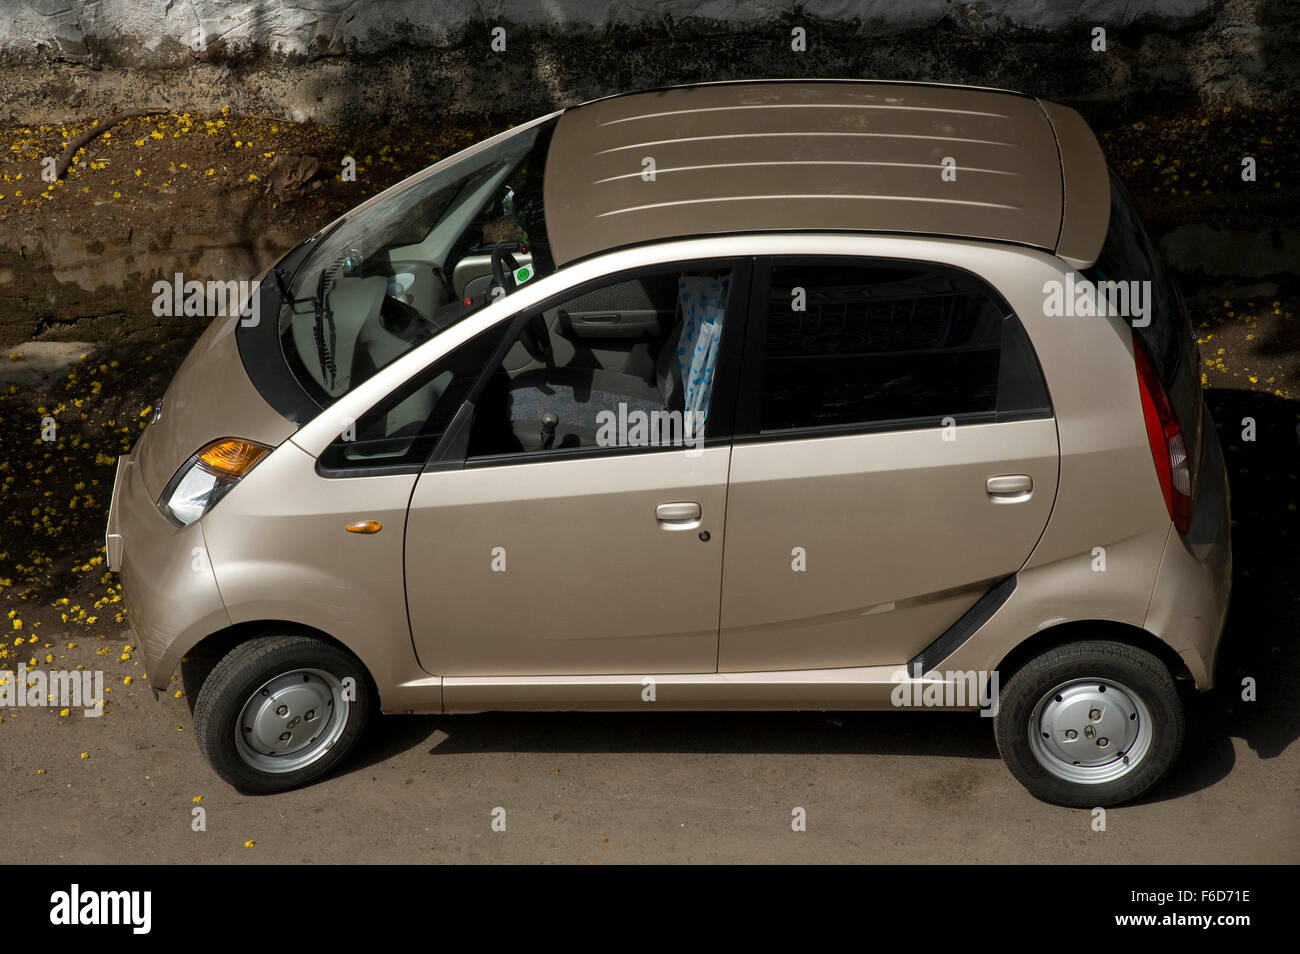 Tata Nano Car Stock Photos & Tata Nano Car Stock Images